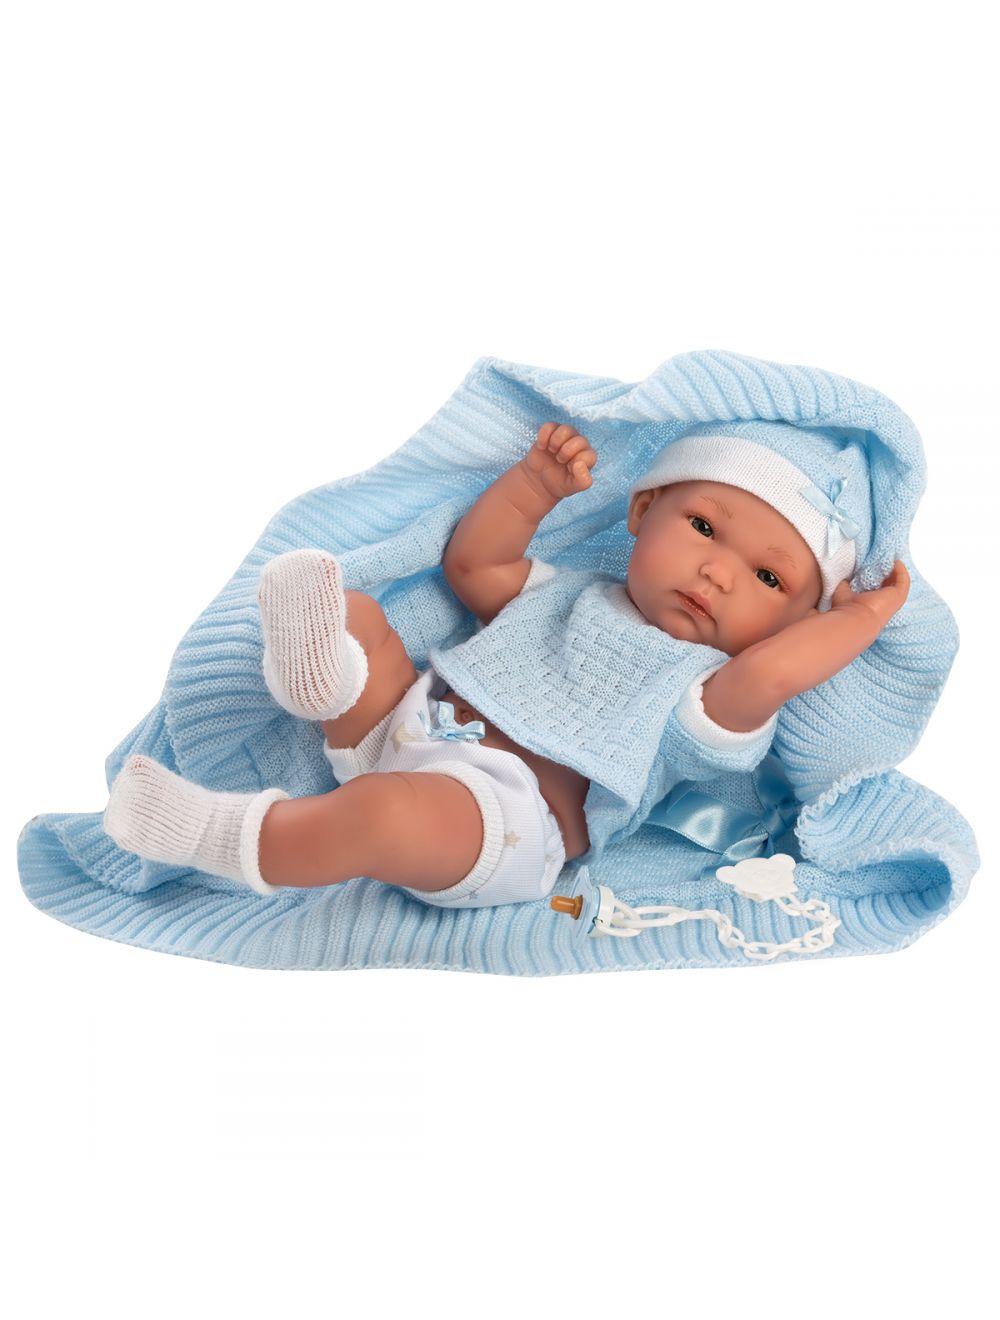 Llorens 63561 Lalka bobas Bimbo 35 cm chłopiec FB